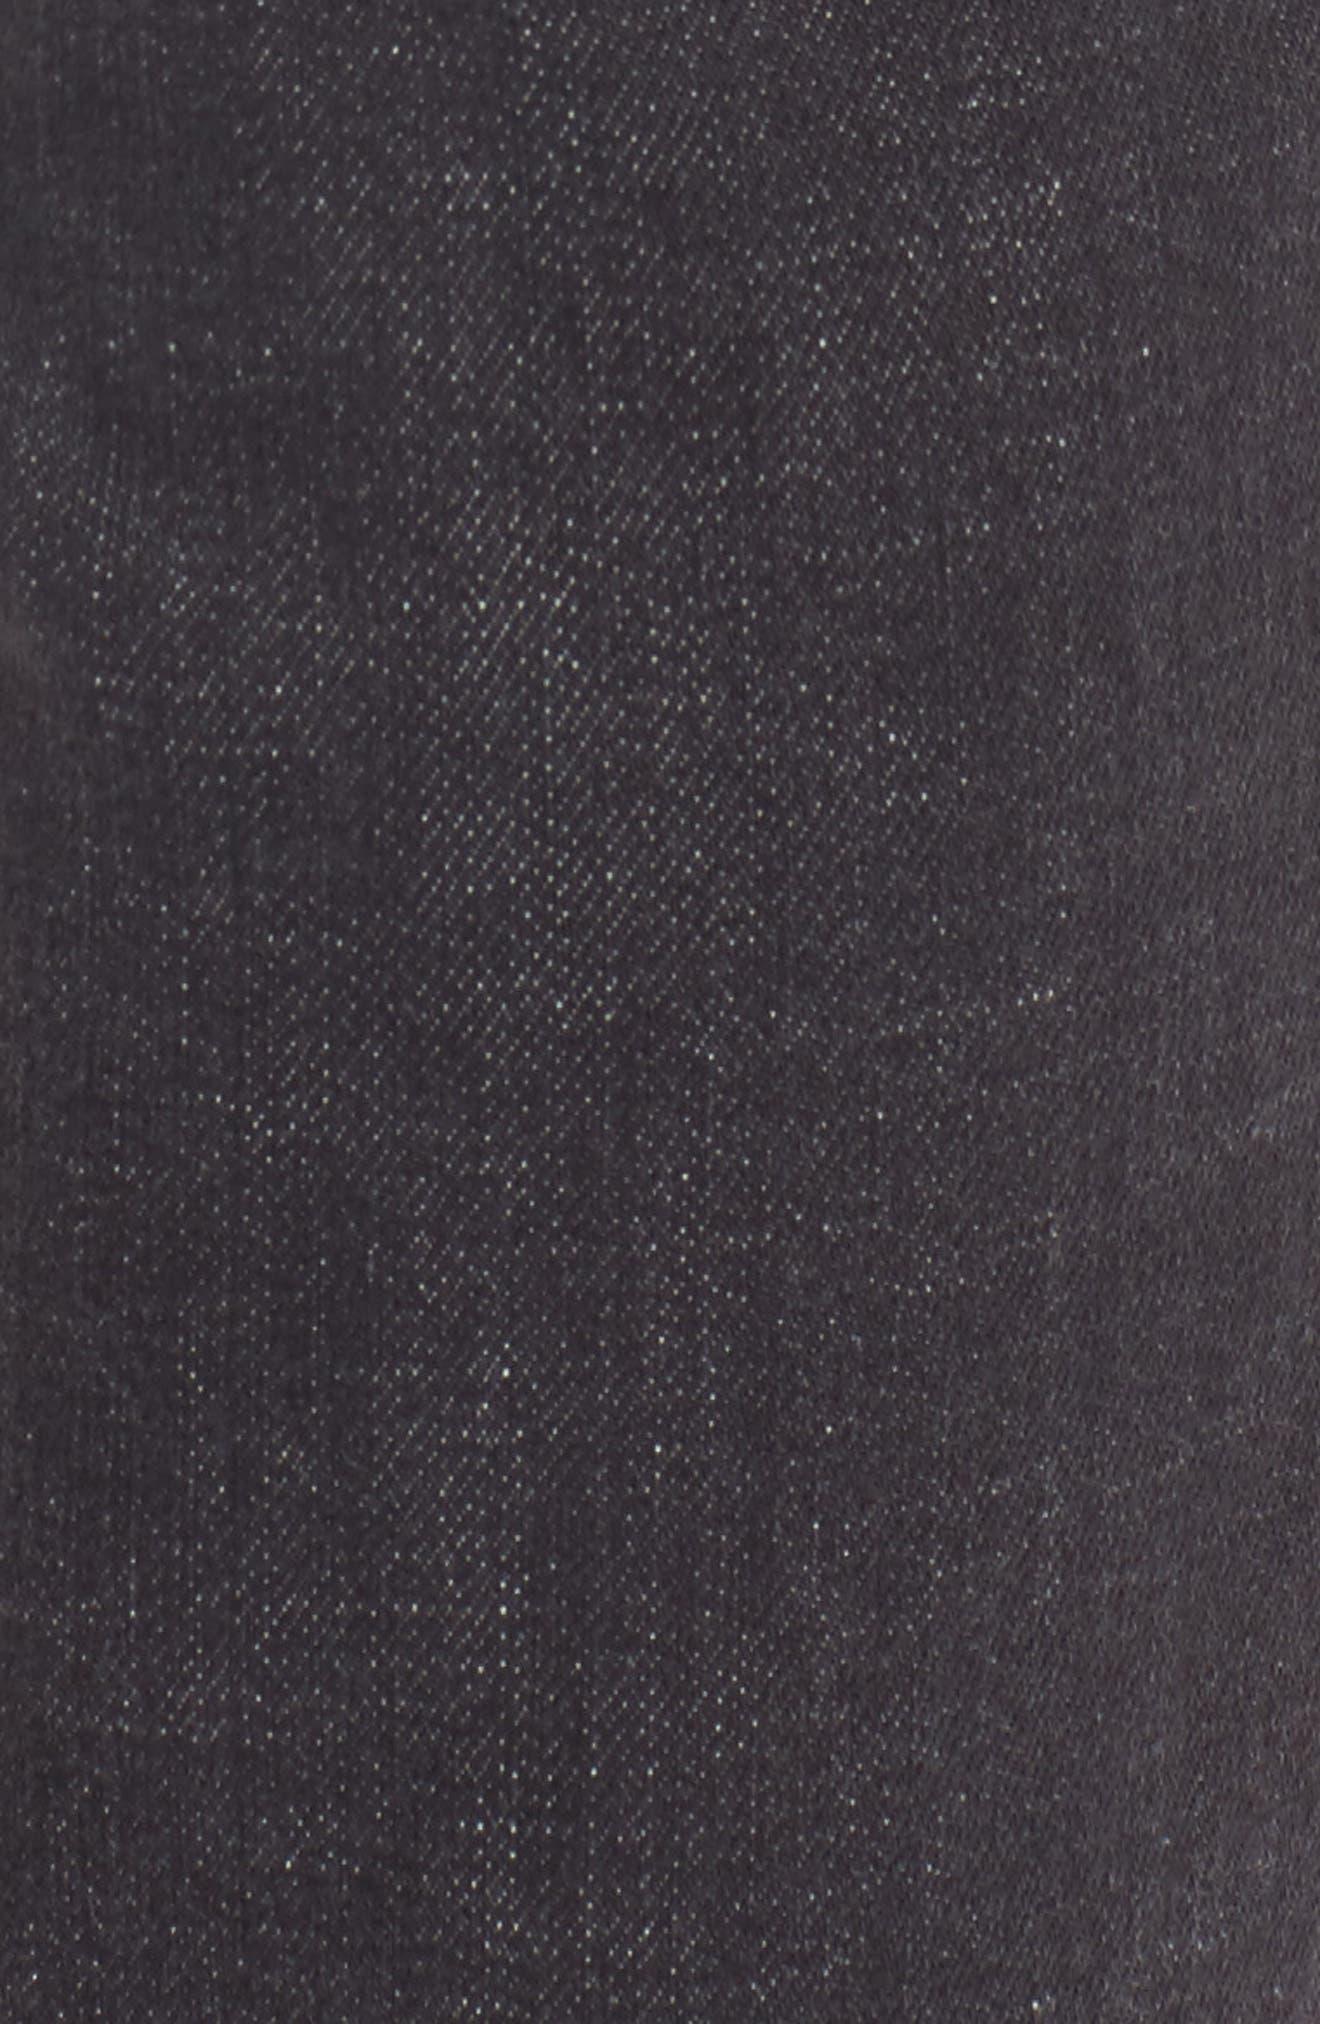 Biker Denim Jeans,                             Alternate thumbnail 5, color,                             Black